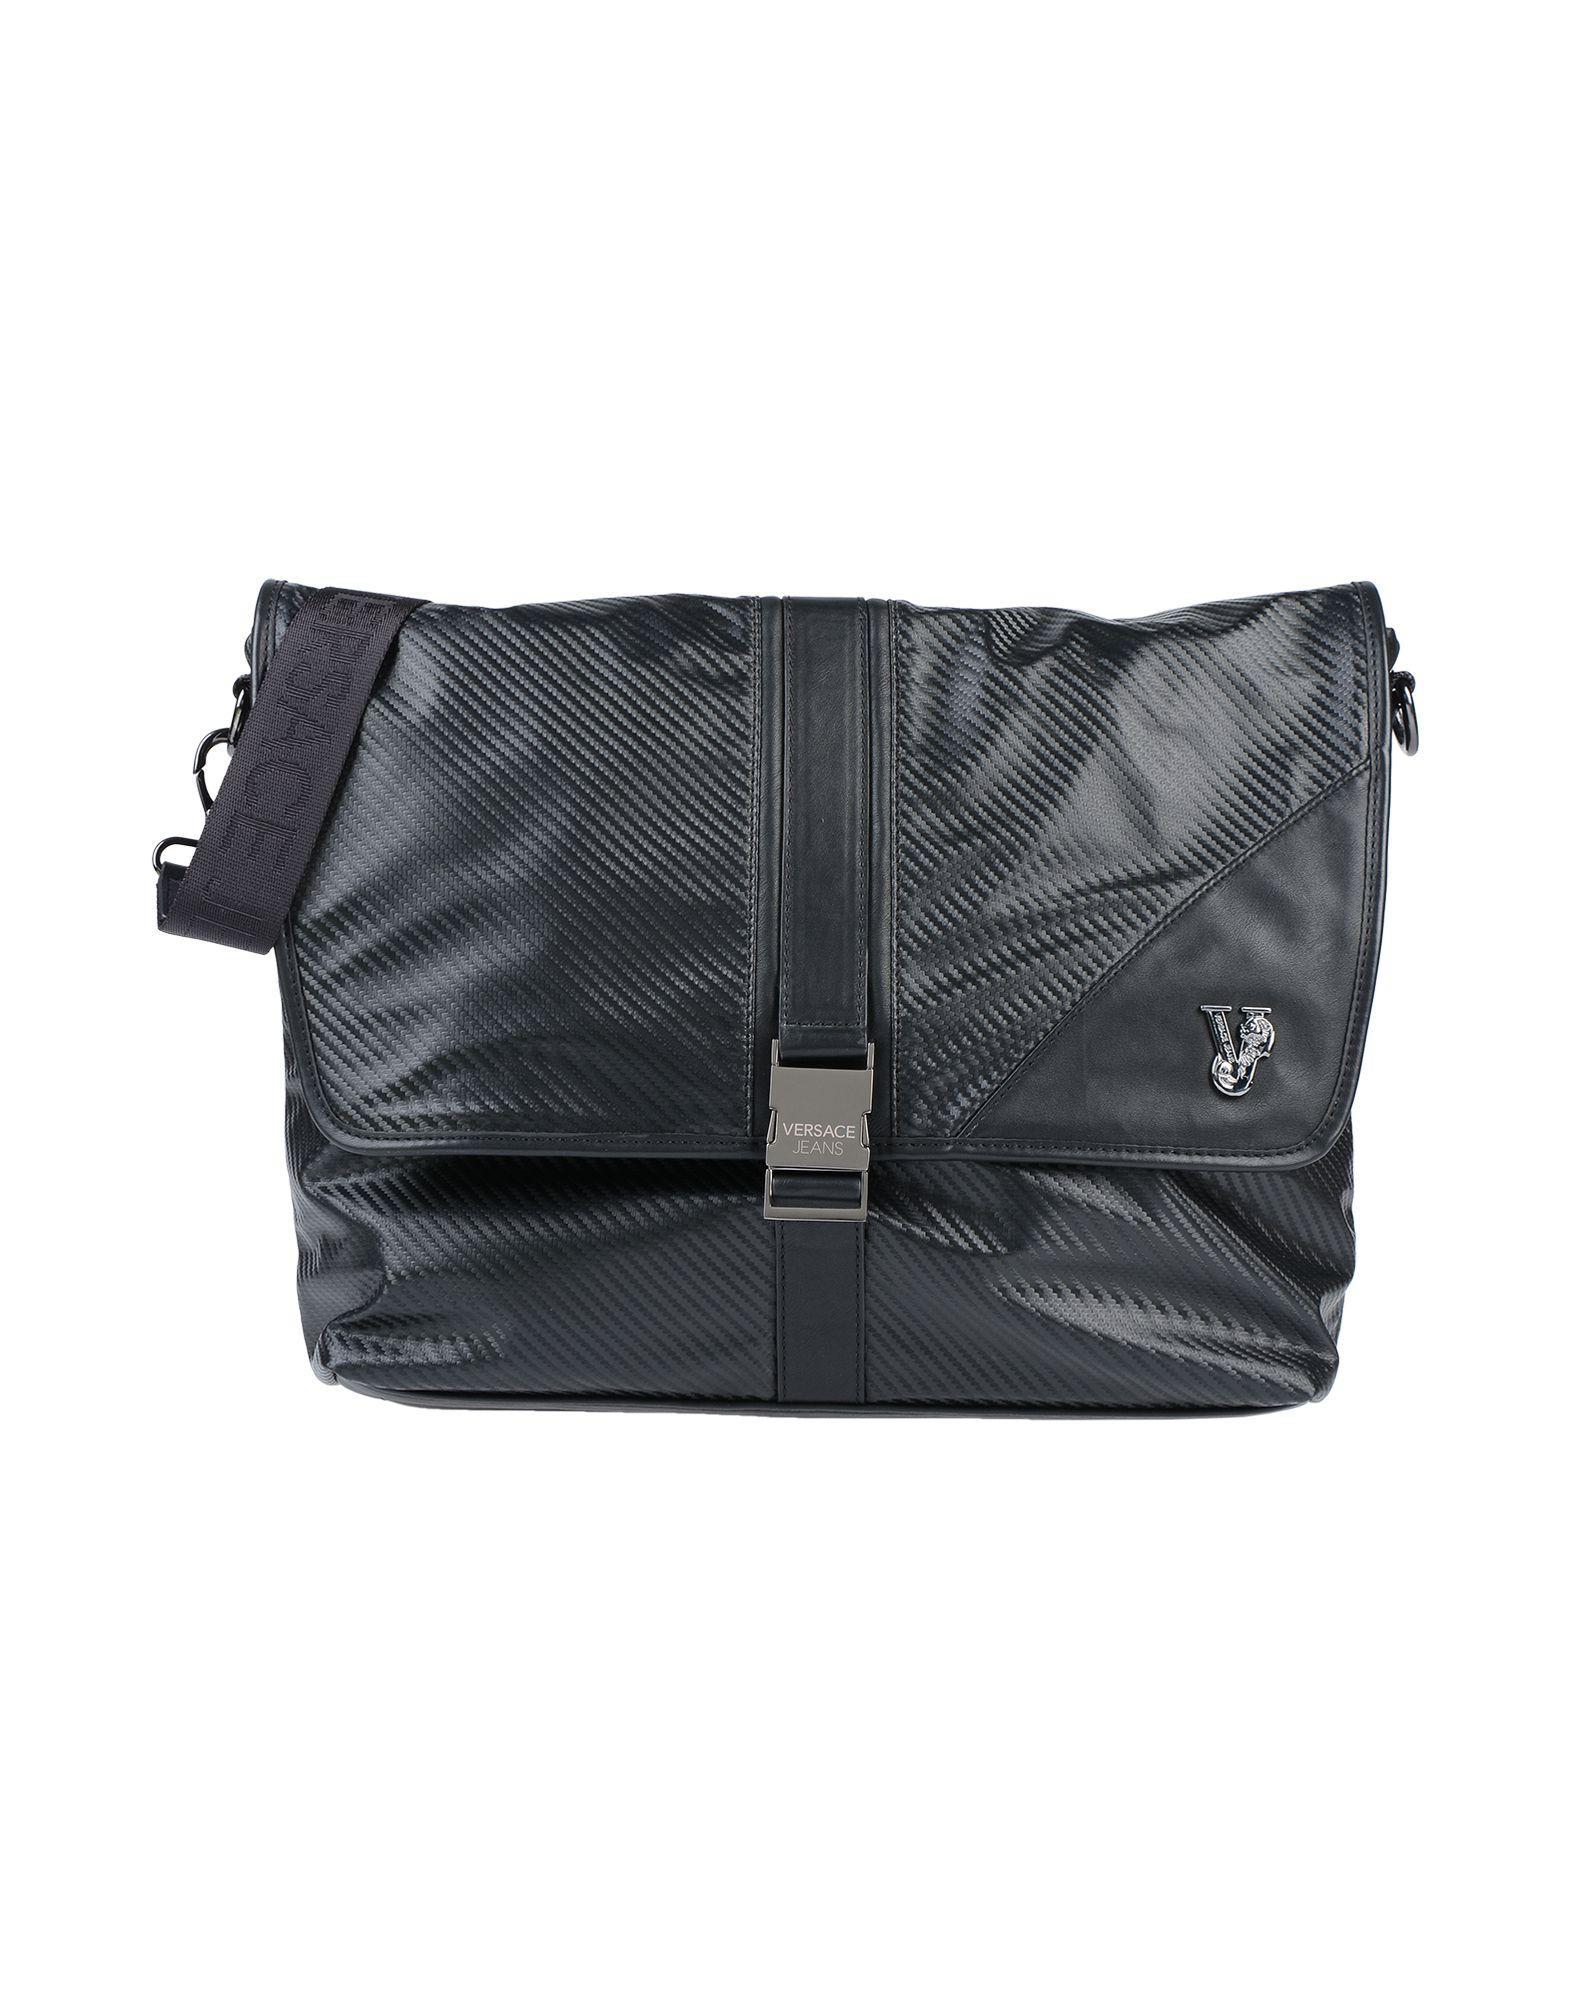 Versace Jeans - Black Cross-body Bag for Men - Lyst. View fullscreen 6d3ff3f4e6bb7